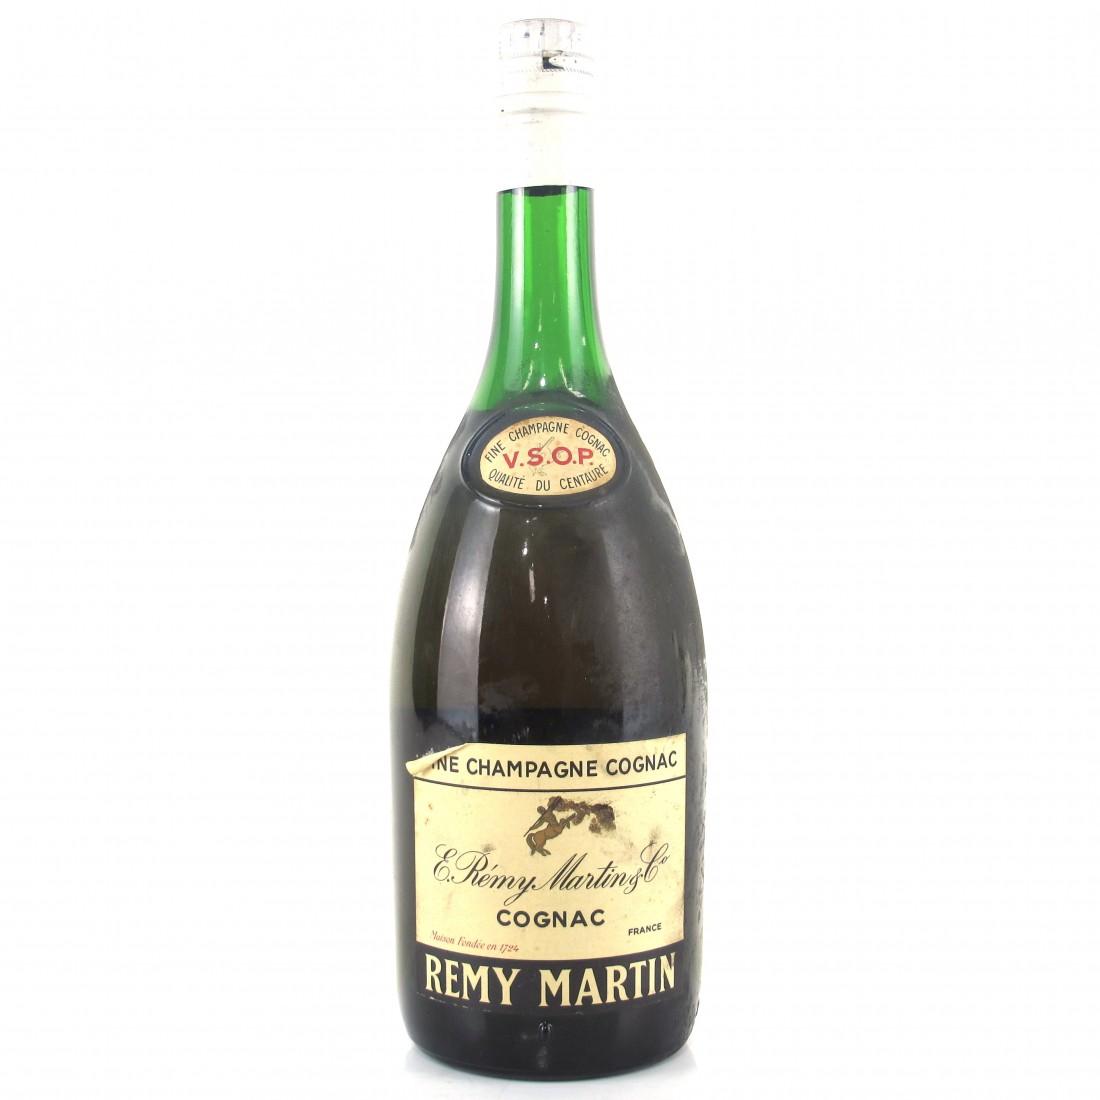 Remy Martin VSOP Cognac Circa 1970s